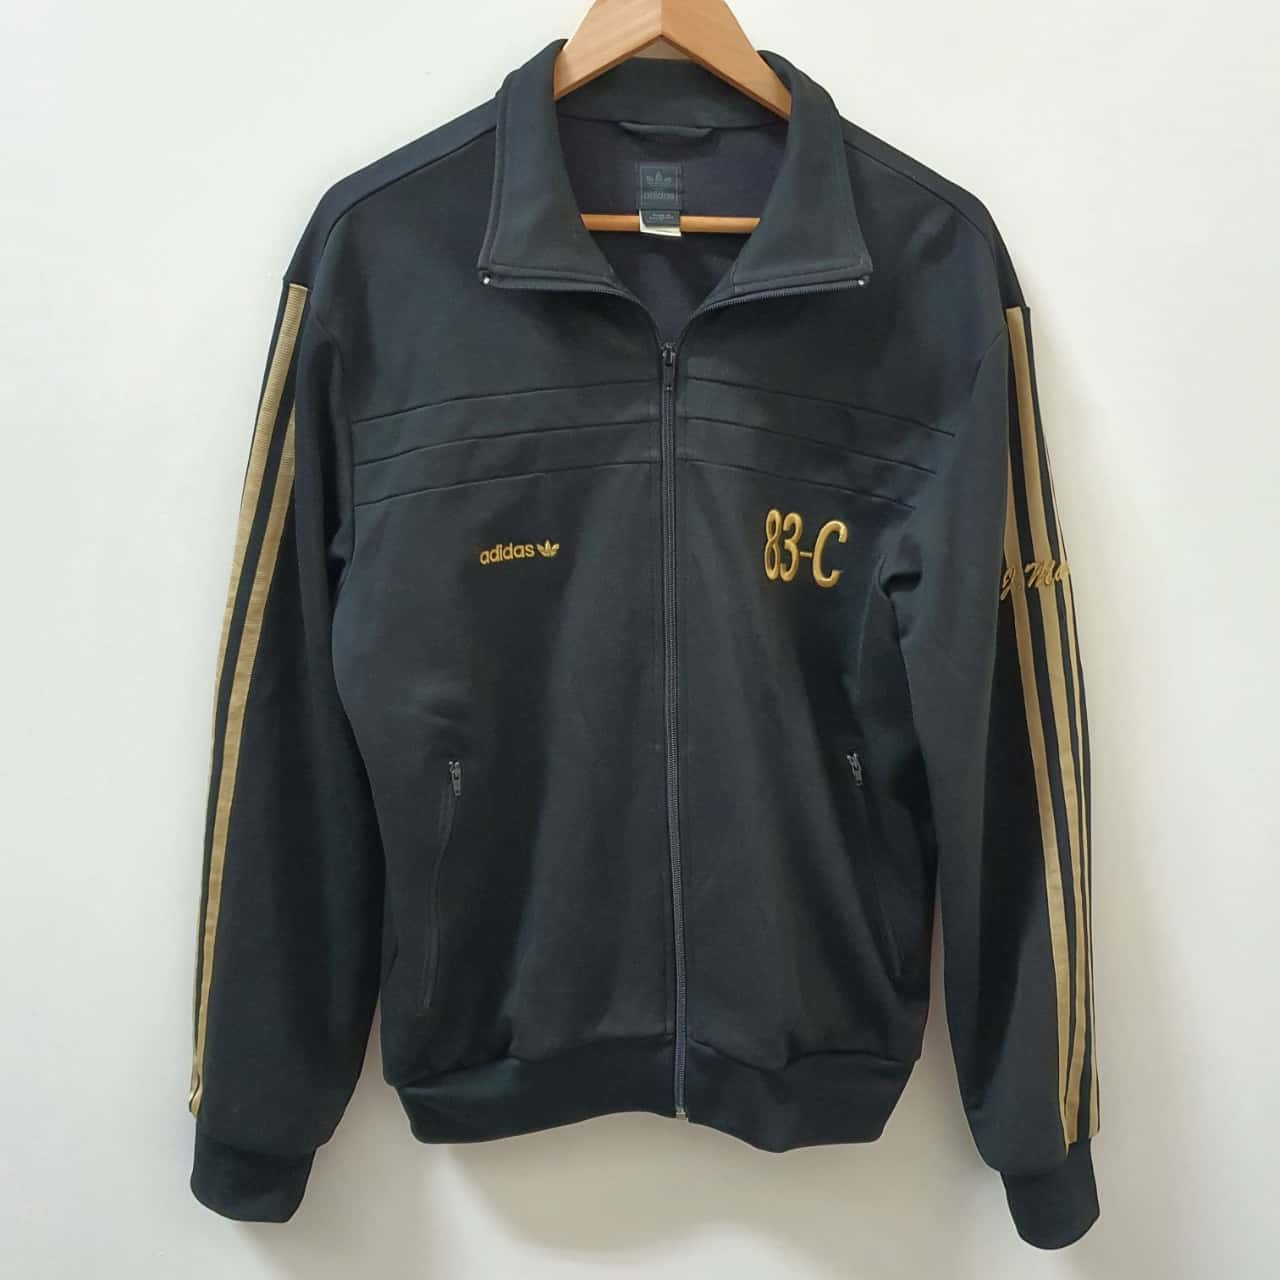 Men's 'Adidas' Jacket - Size L